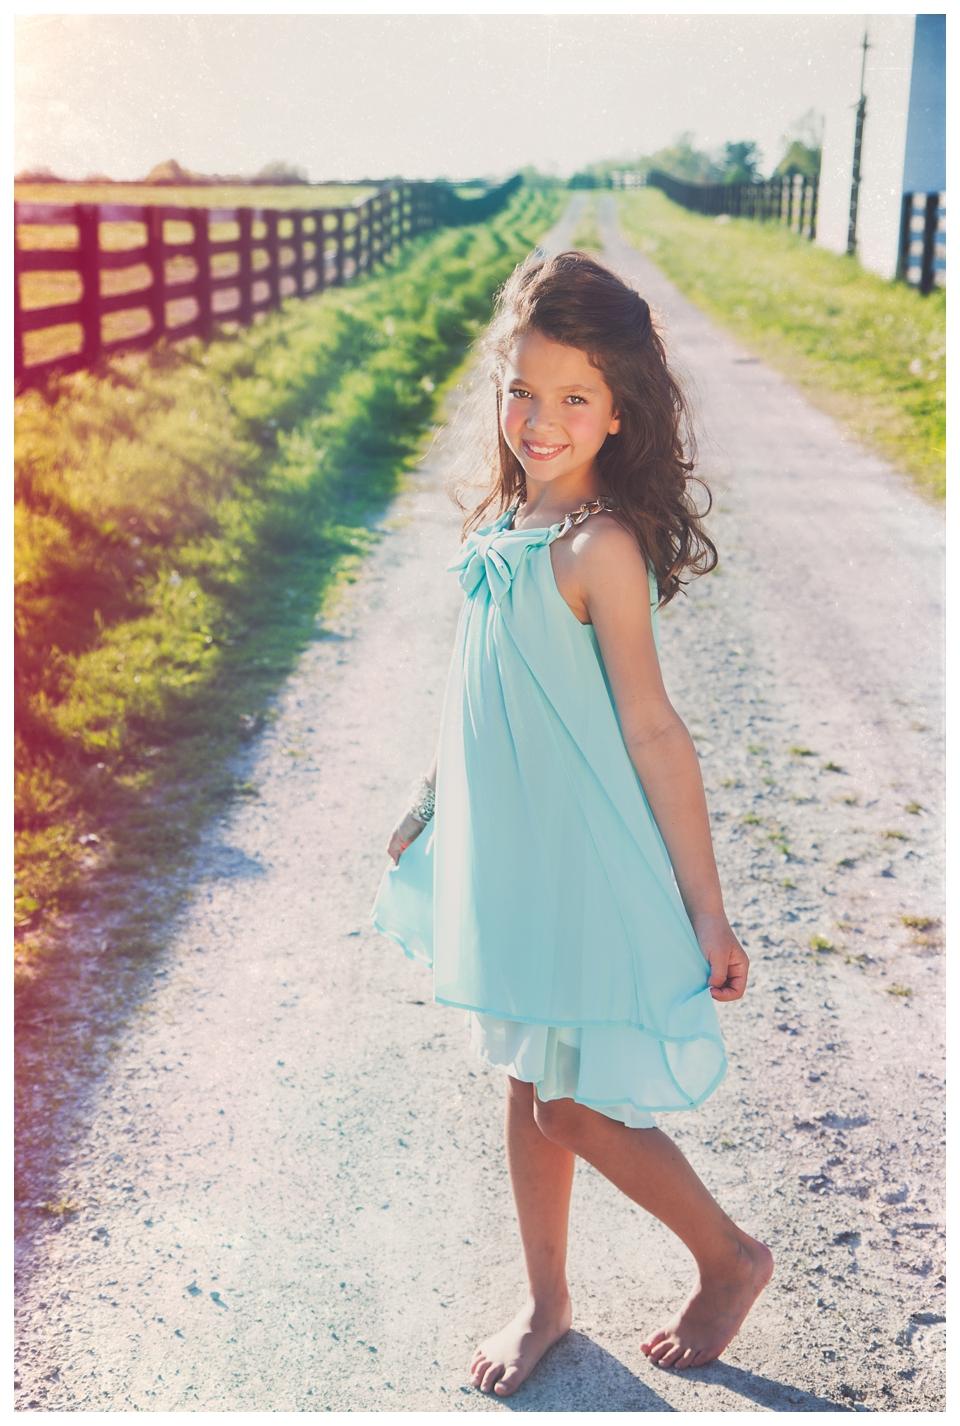 Denver Child Model Photography   Child Model, Dance, Senior, & Fine Art   Katie Andelman Photography